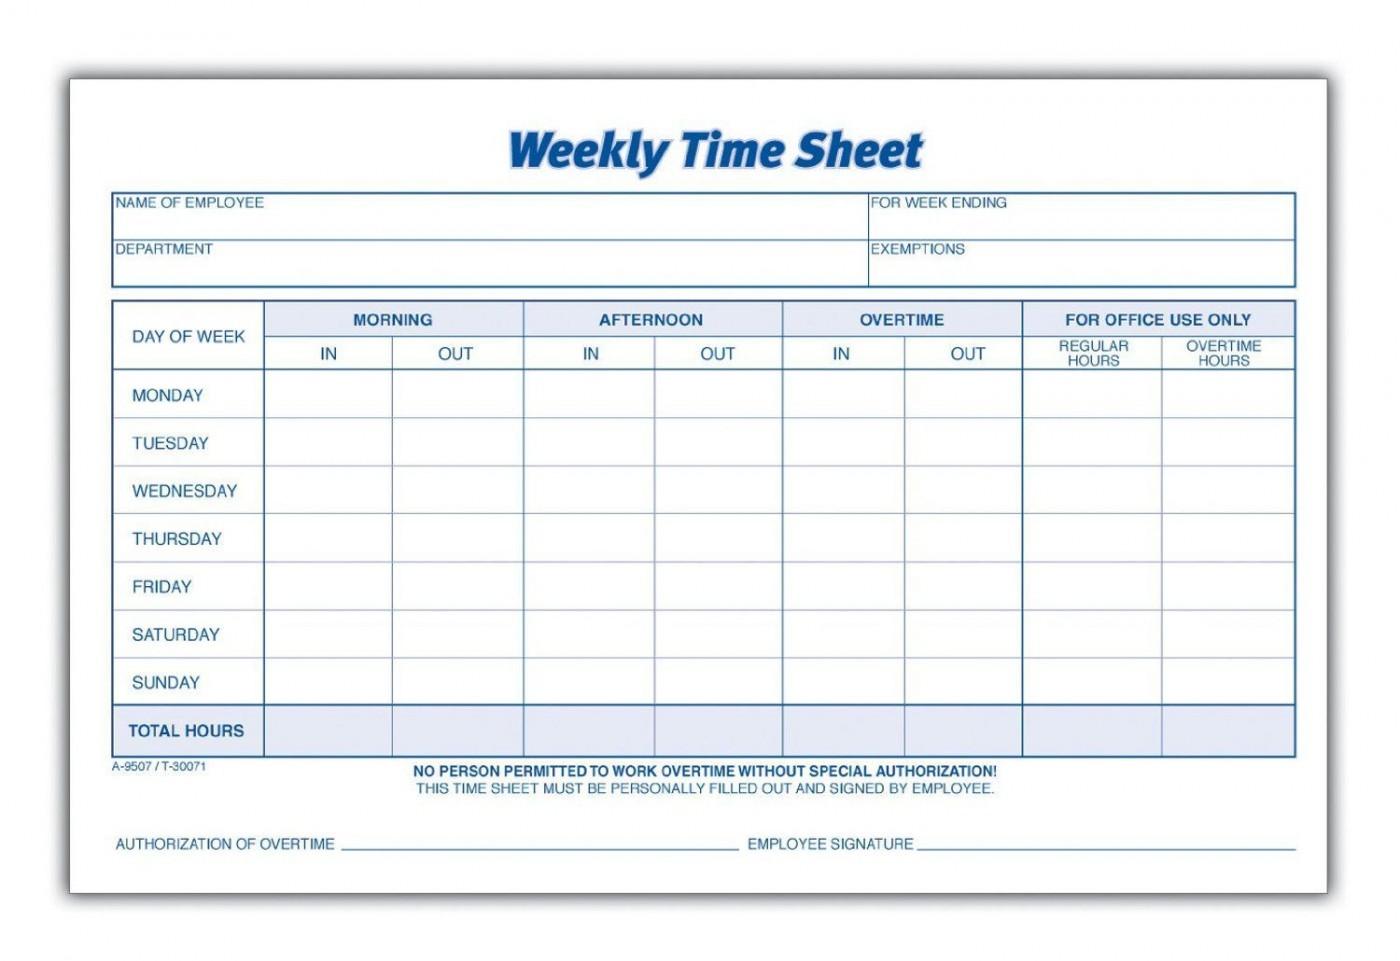 000 Rare Employee Time Card Printable Sample  Timesheet Template Excel Free Multiple Sheet1400